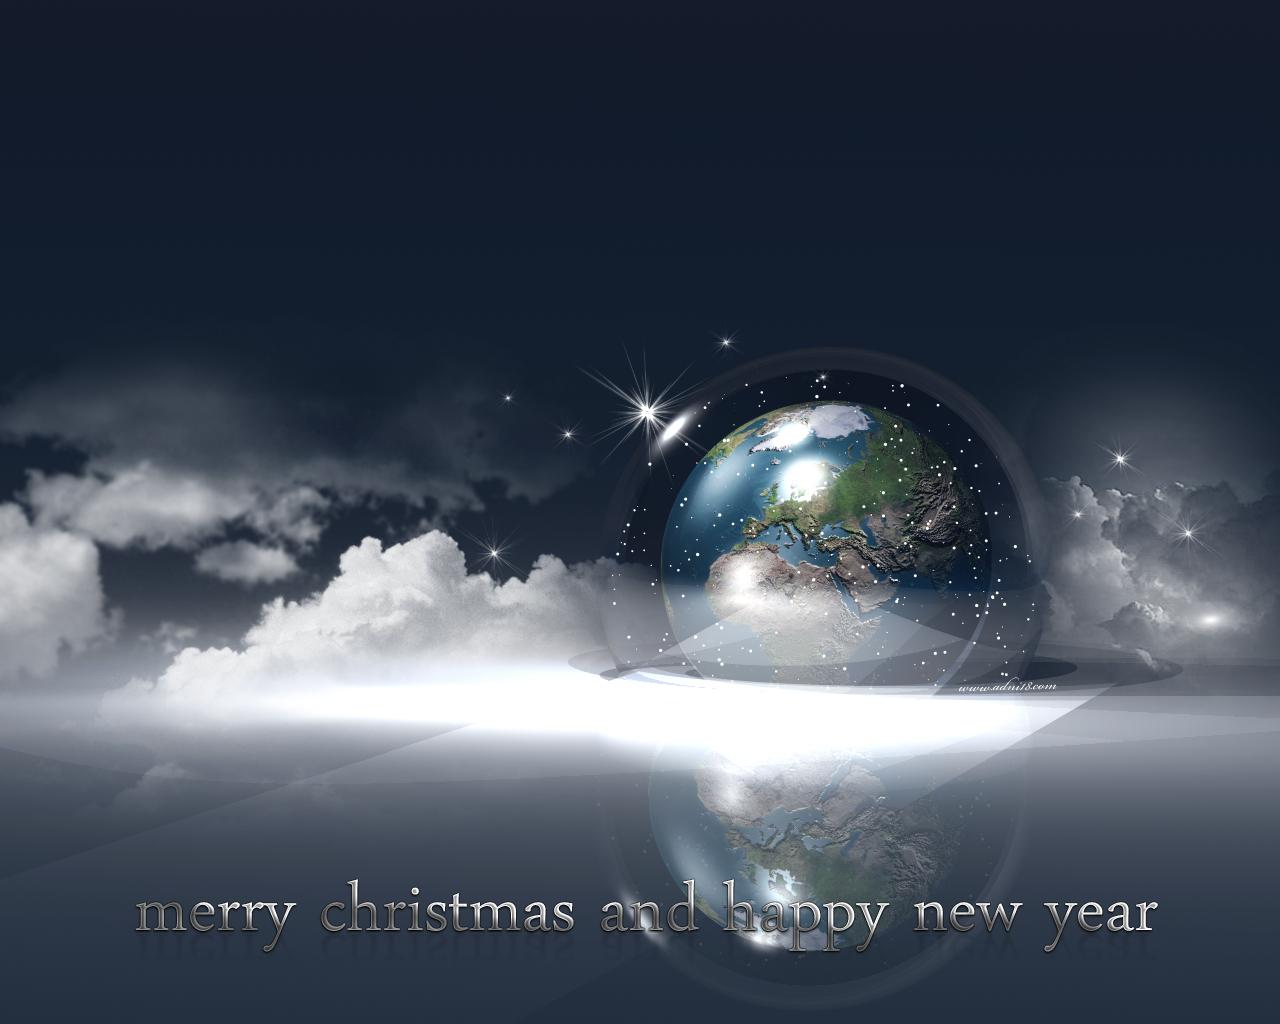 http://2.bp.blogspot.com/-d5MpxrCzy7U/Tu2l4X07hGI/AAAAAAAABbs/YH9bzYYHXDs/s1600/White_Christmas_by_adni18.jpg